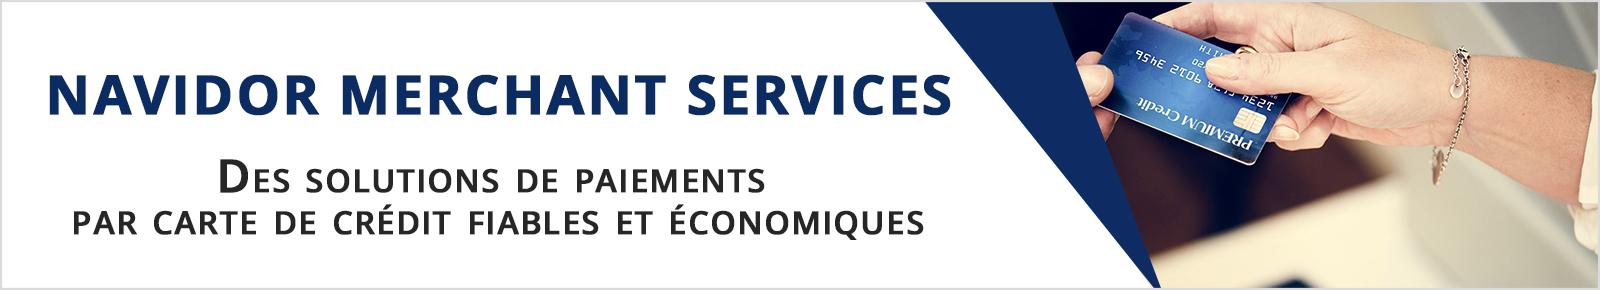 Navidor Merchant Services – Yves HADDAD